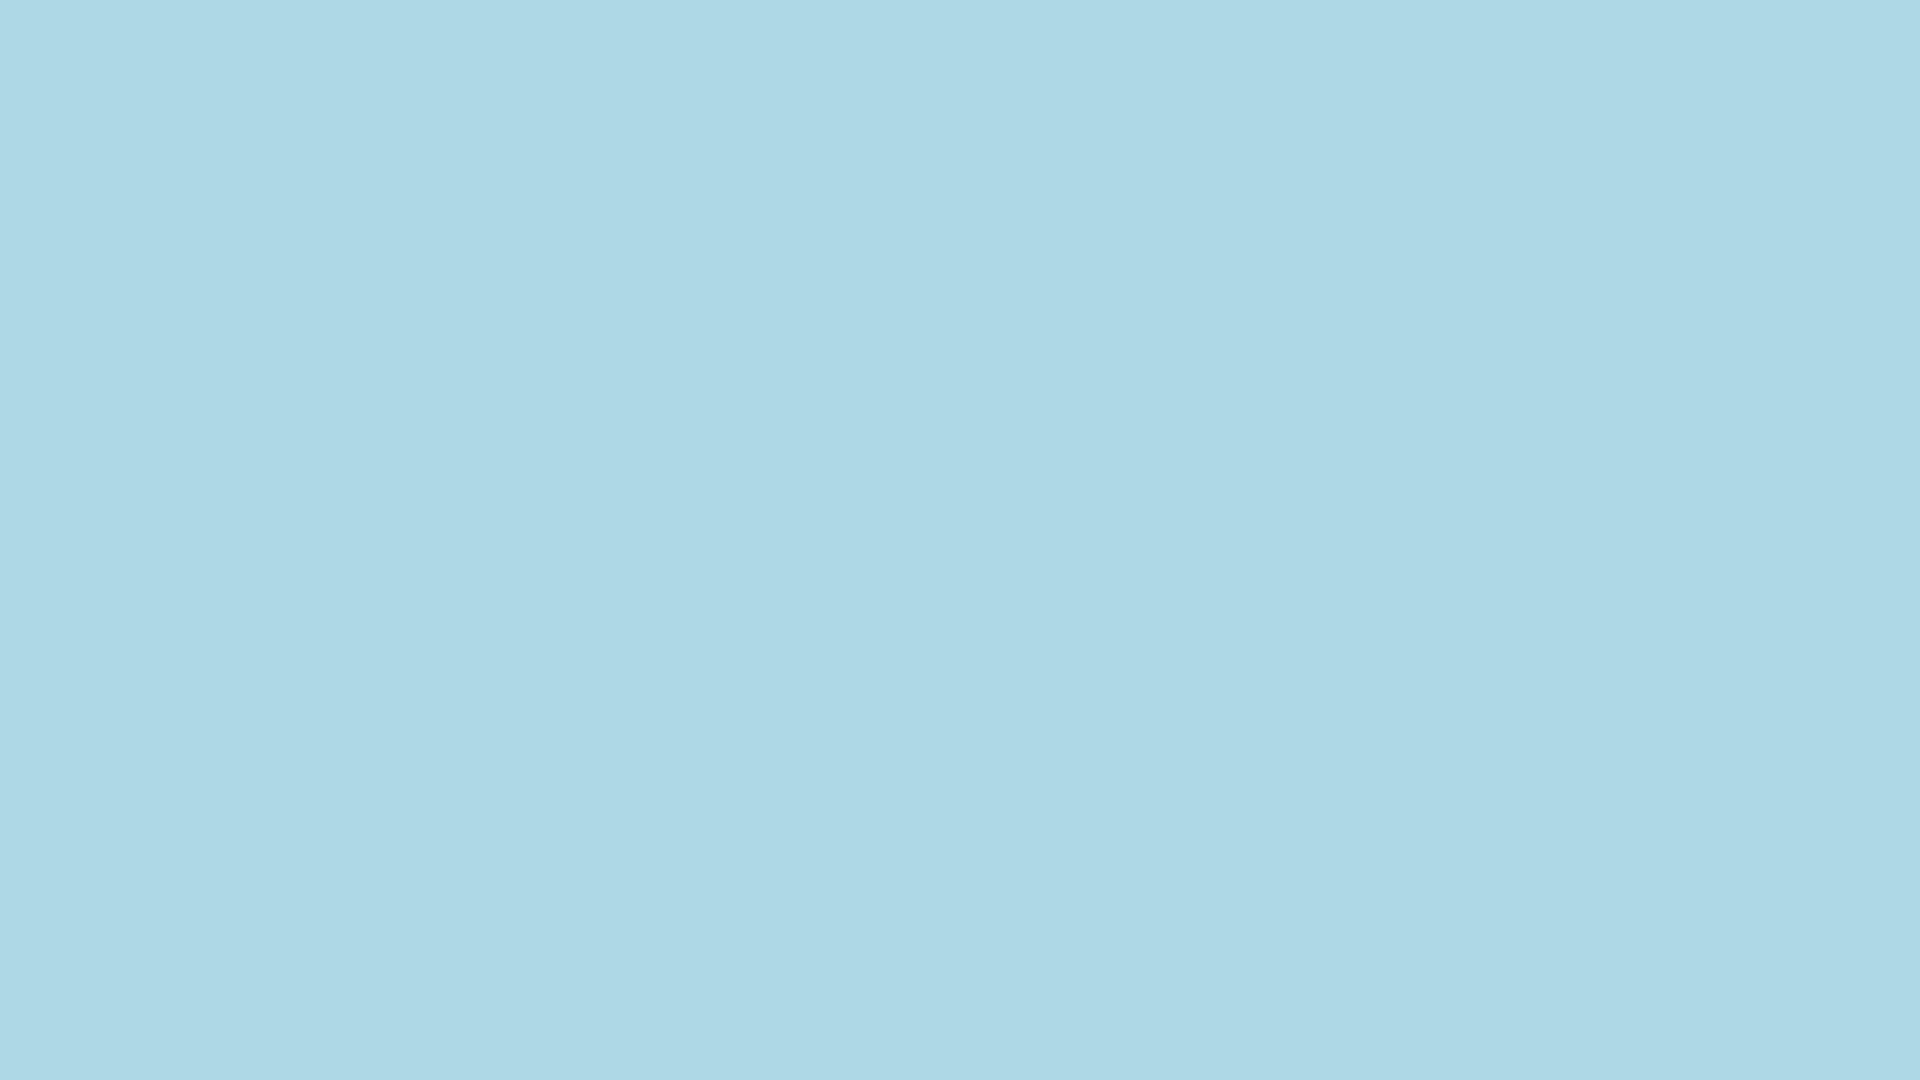 1920x1080 light blue solid